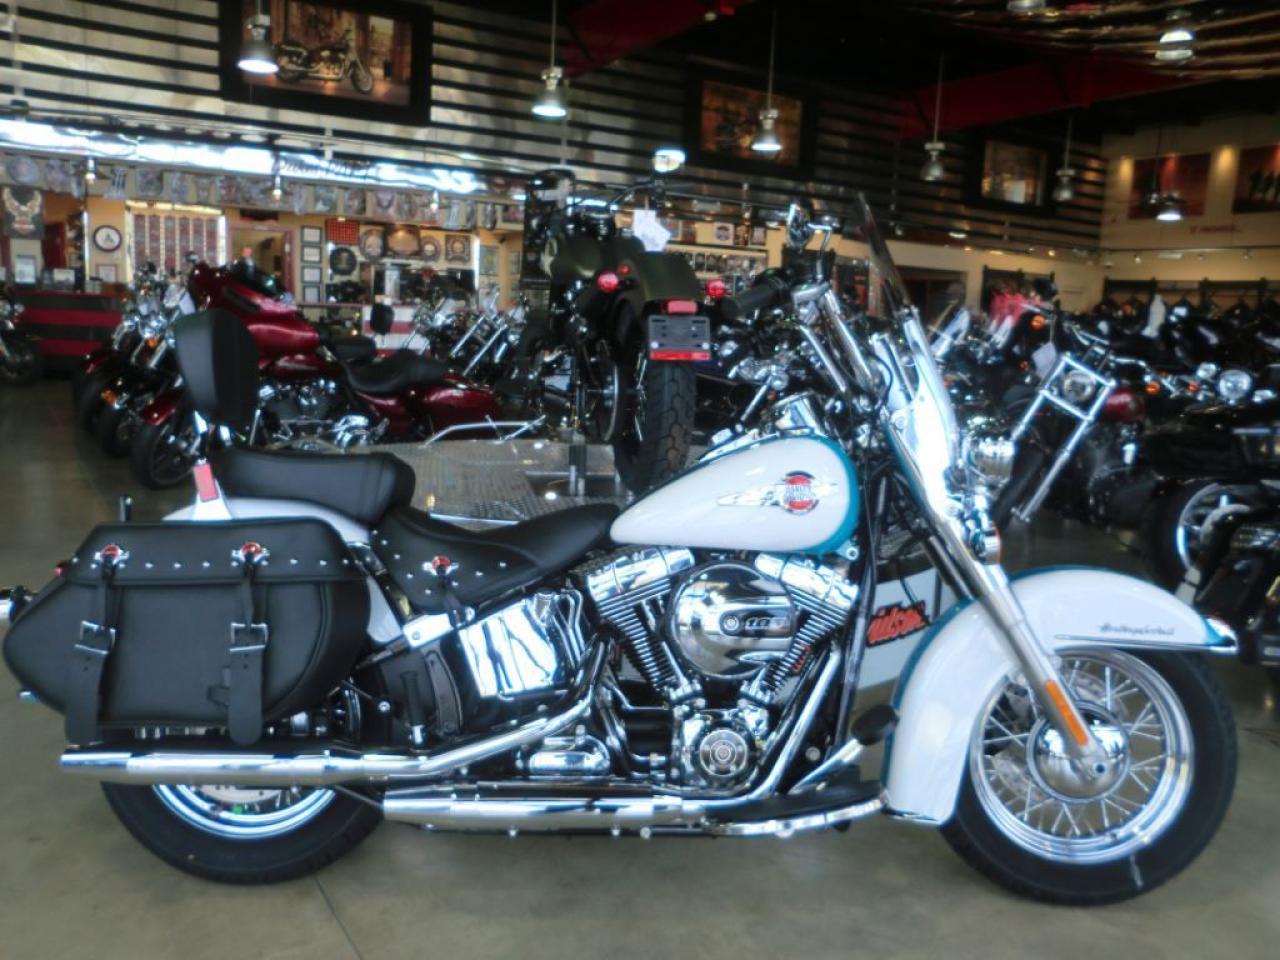 2017 Harley-Davidson Heritage Softail Classic FLSTC HERITAGE